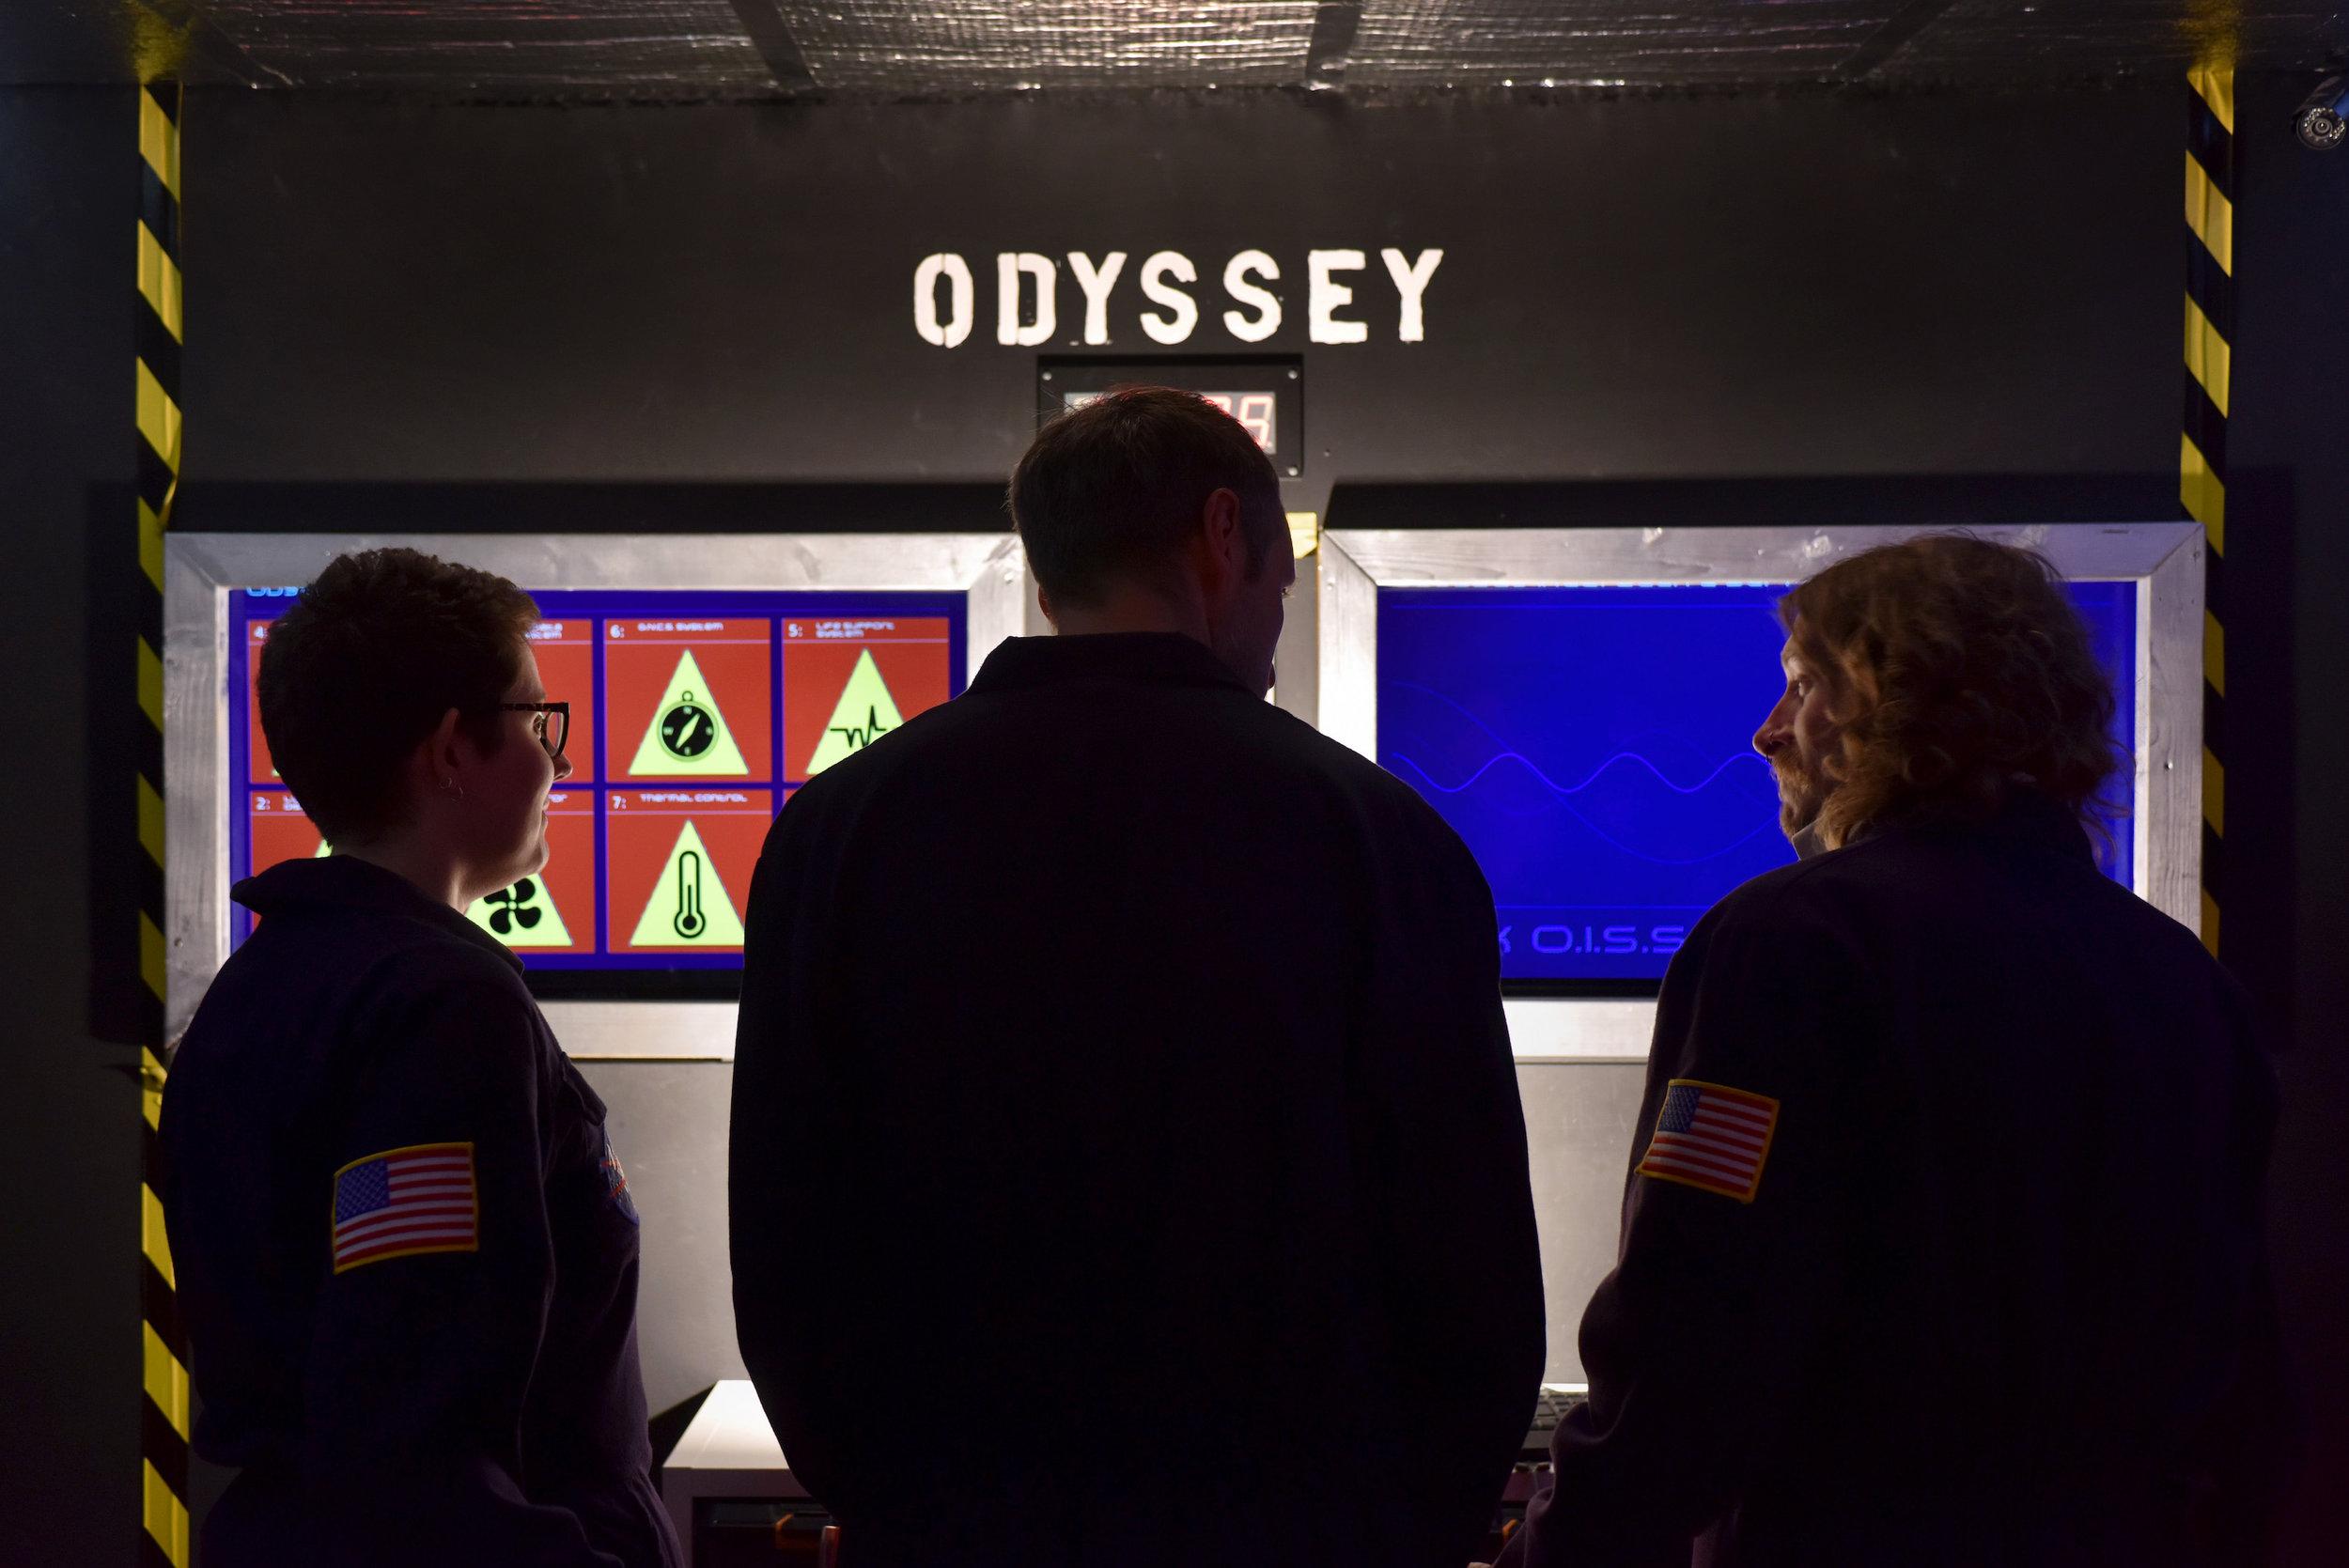 operation odyssey escape room edinburgh